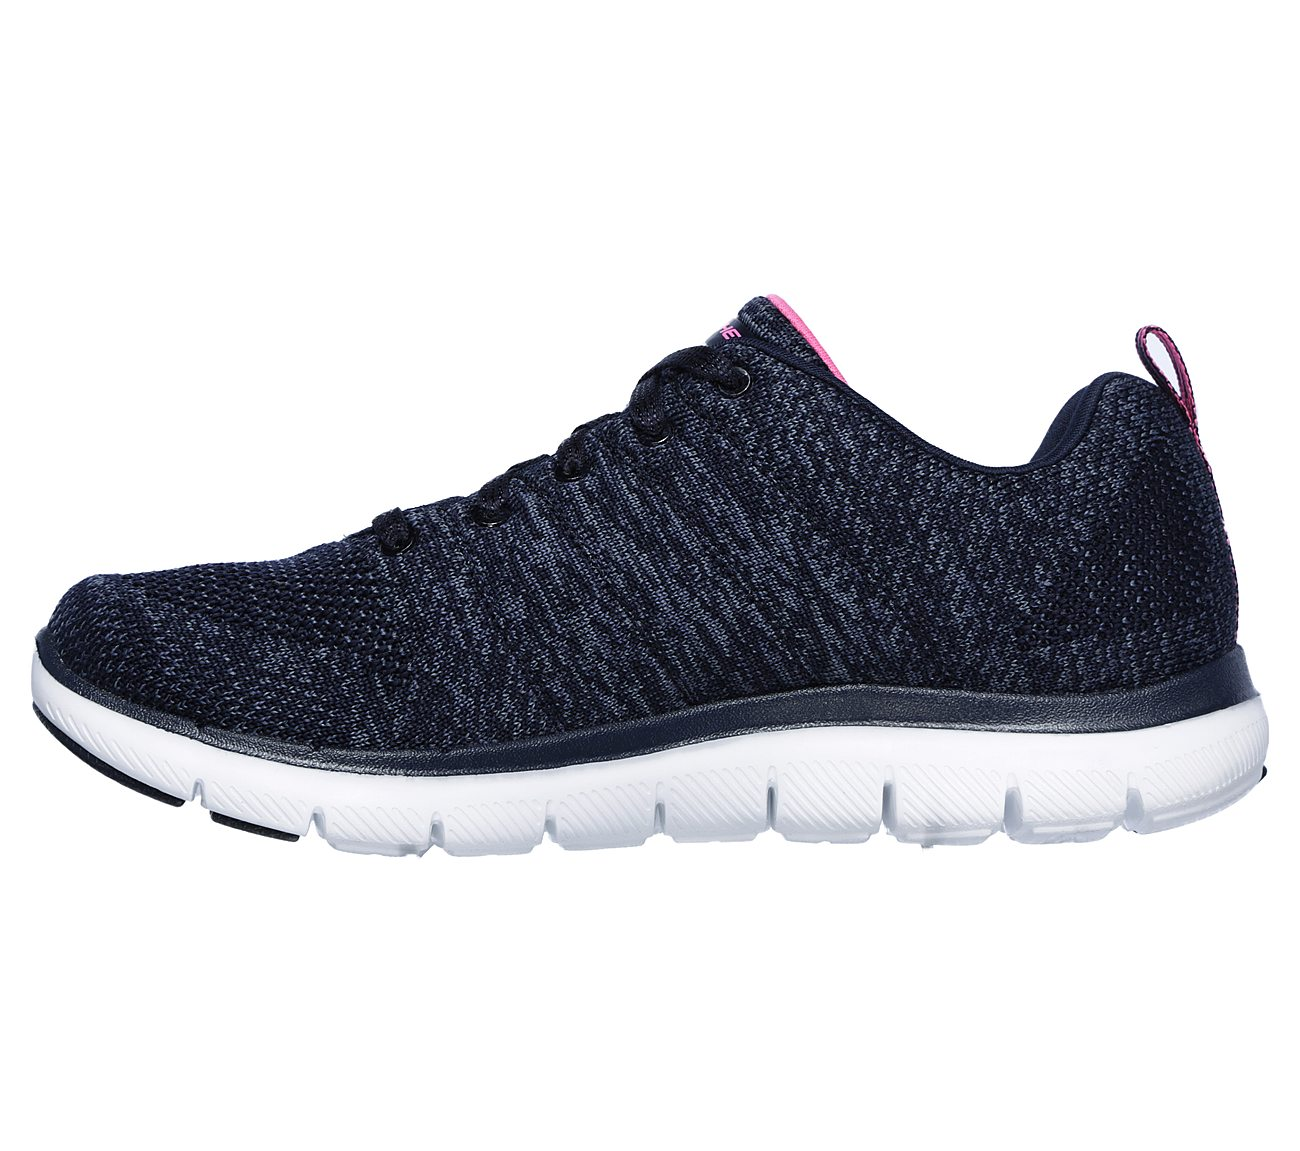 4576f6fb6a22 Buy SKECHERS Flex Appeal 2.0 - High Energy SKECHERS Sport Shoes only ...